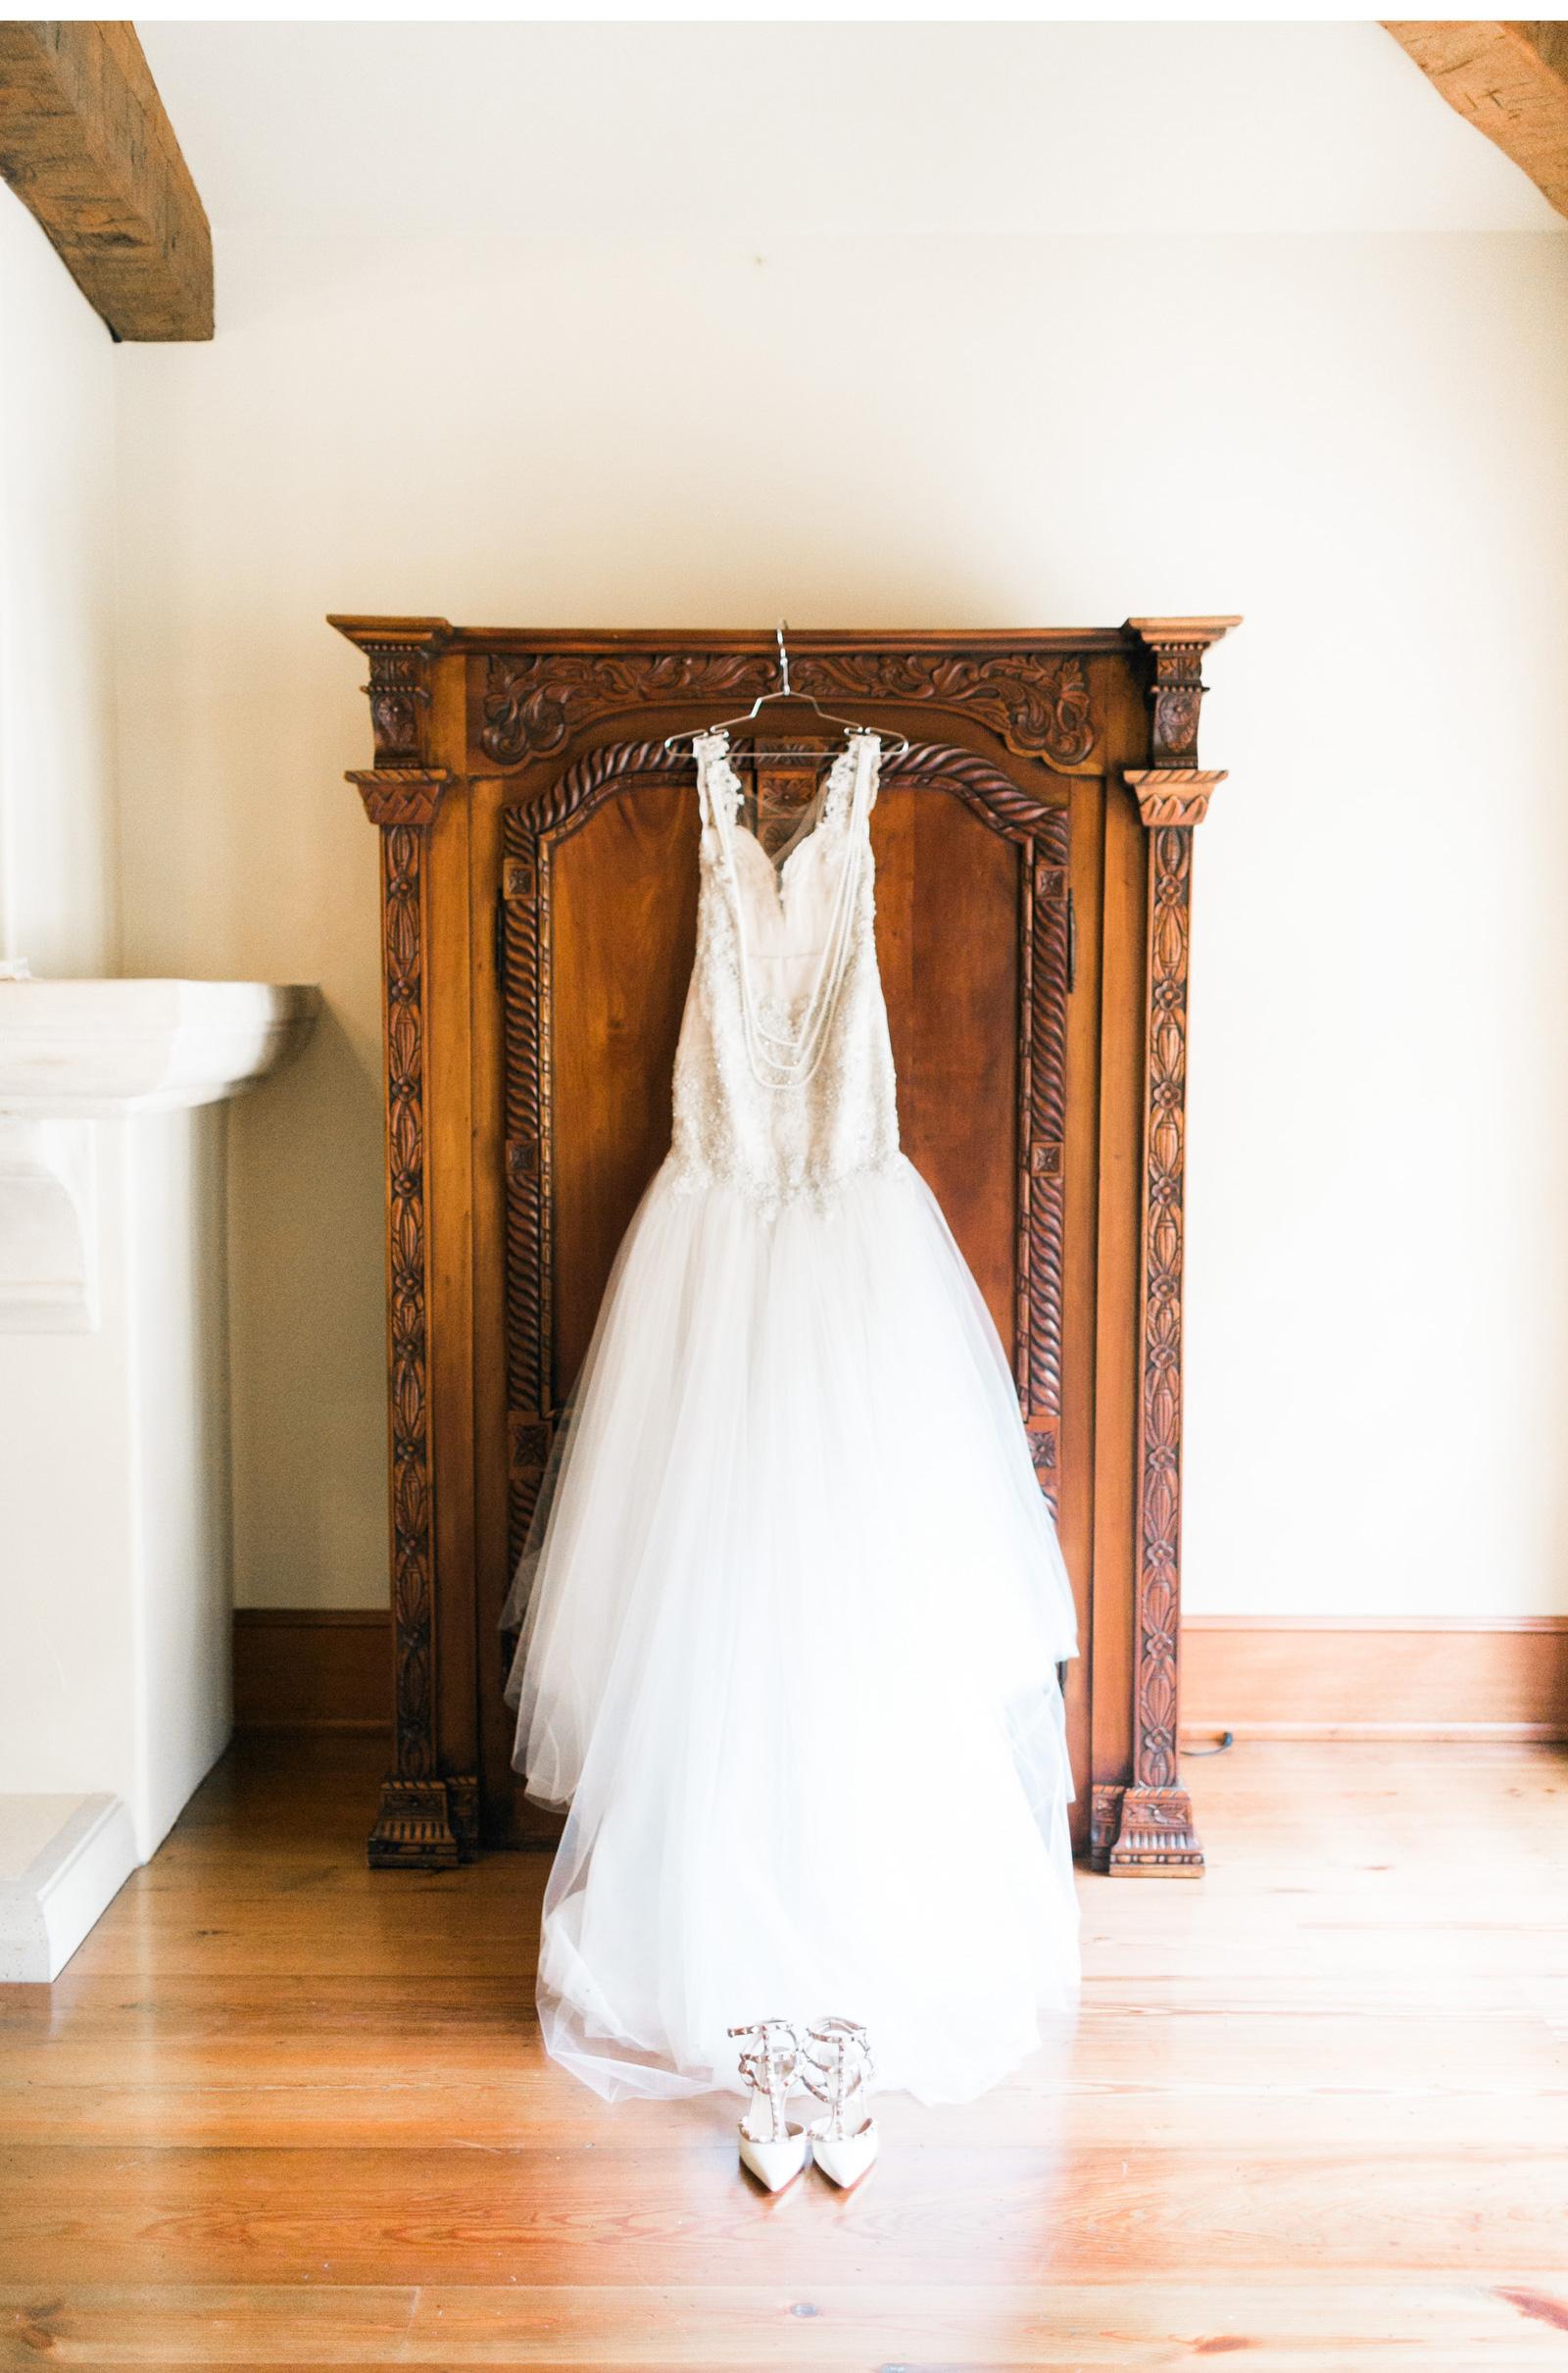 San-Luis-Obispo-Wedding-Photographer-Natalie-Schutt-Photography_07.jpg